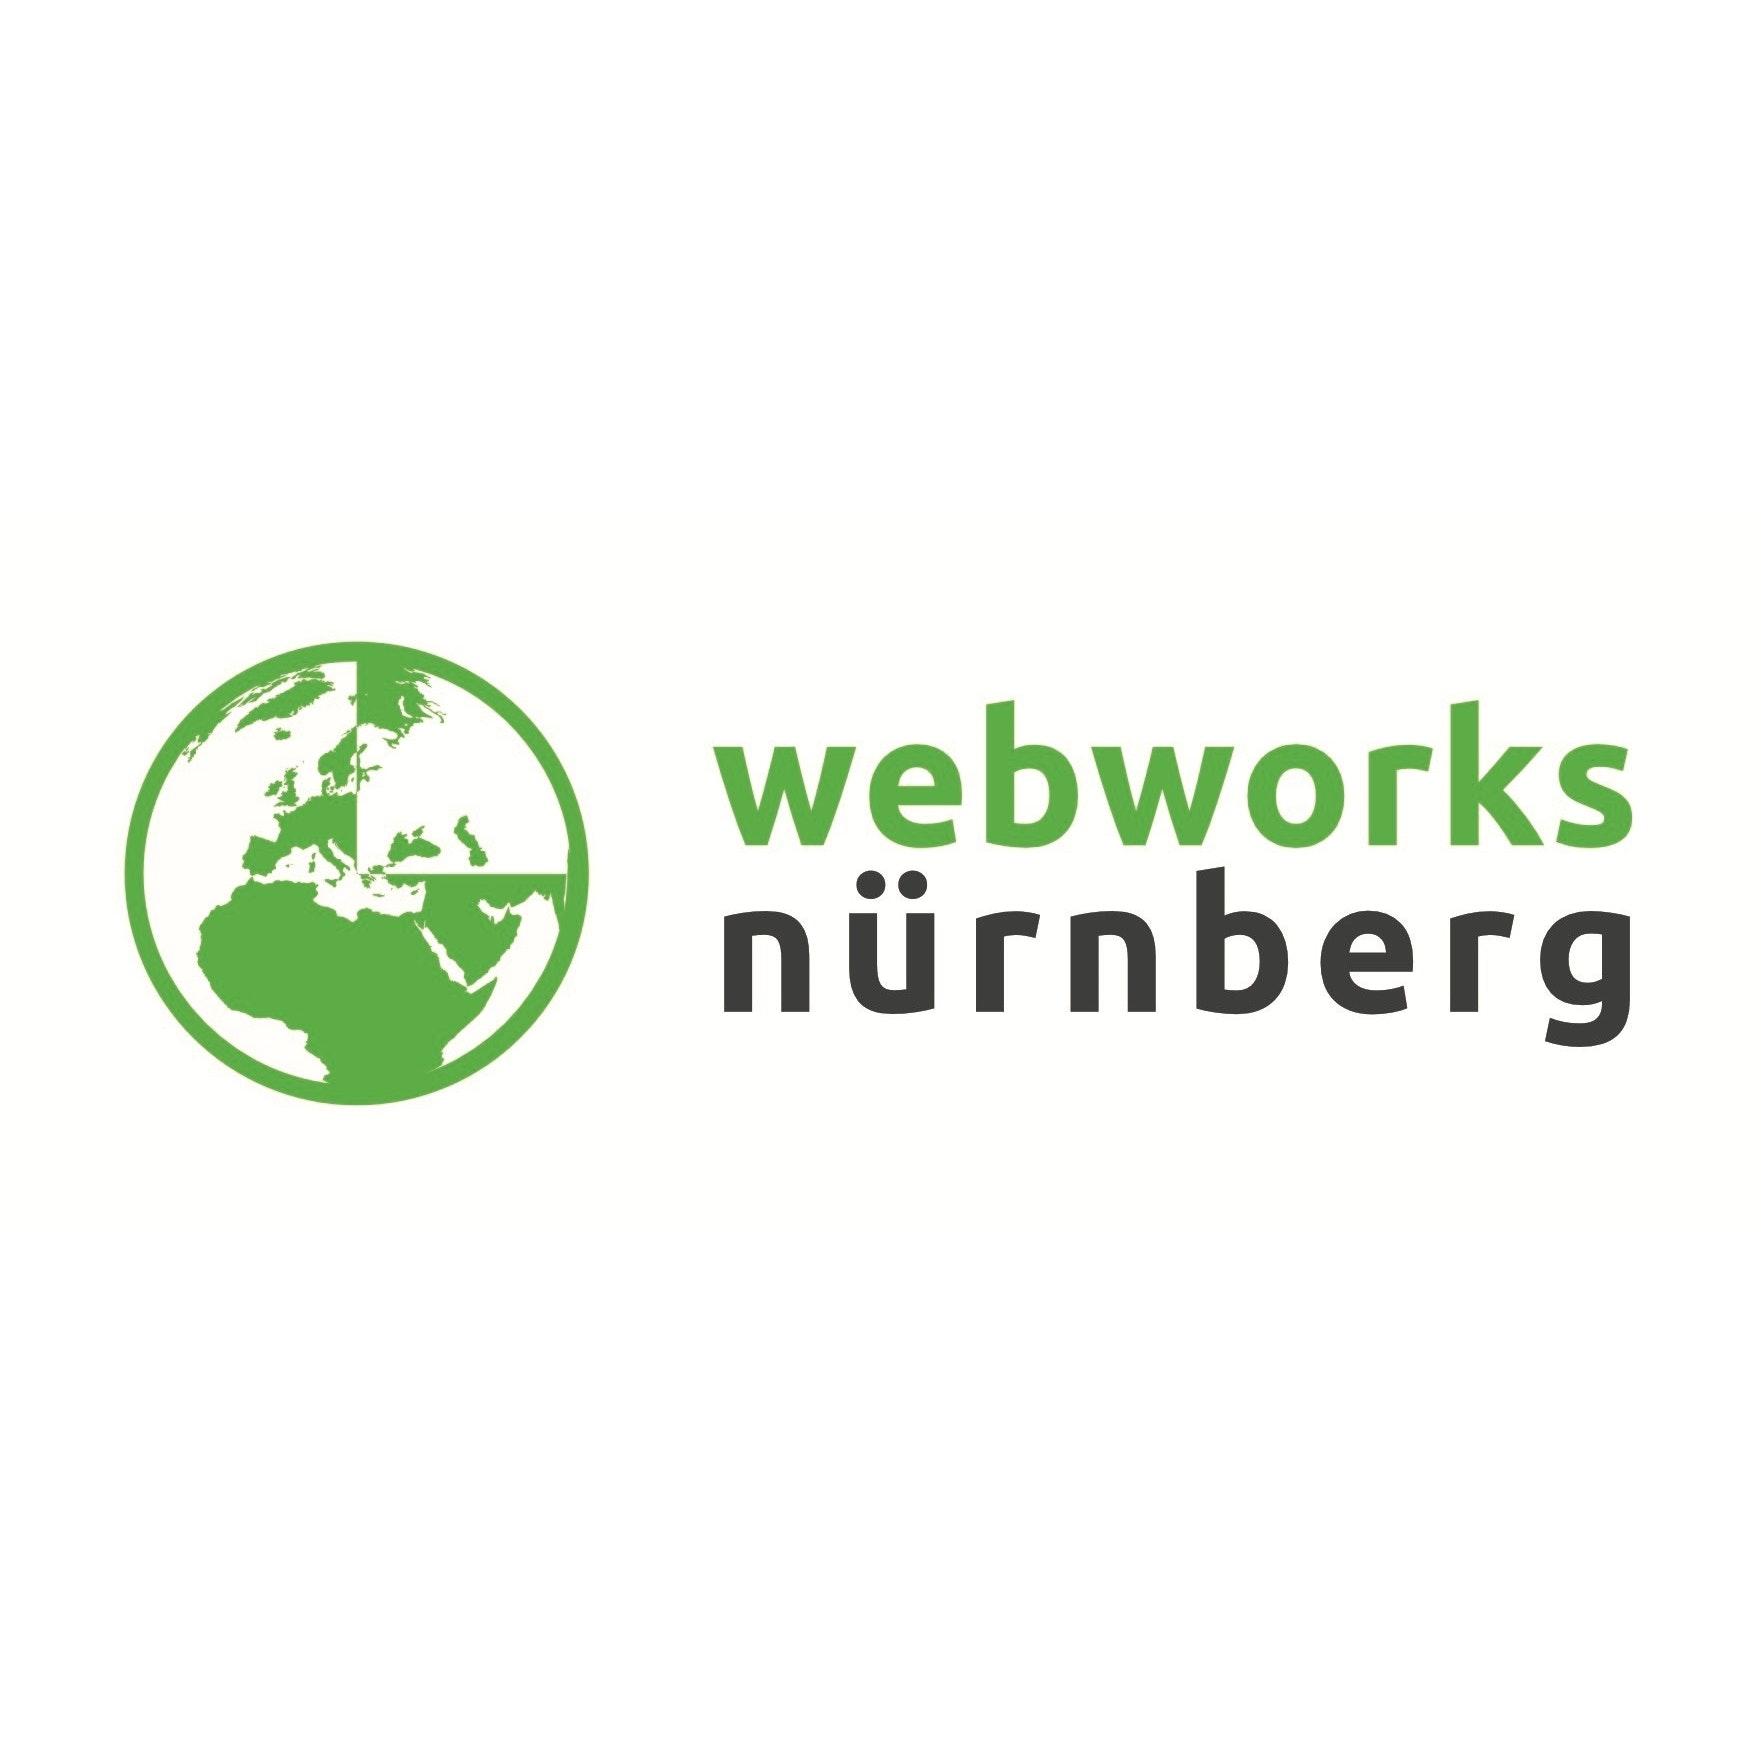 webworks nürnberg